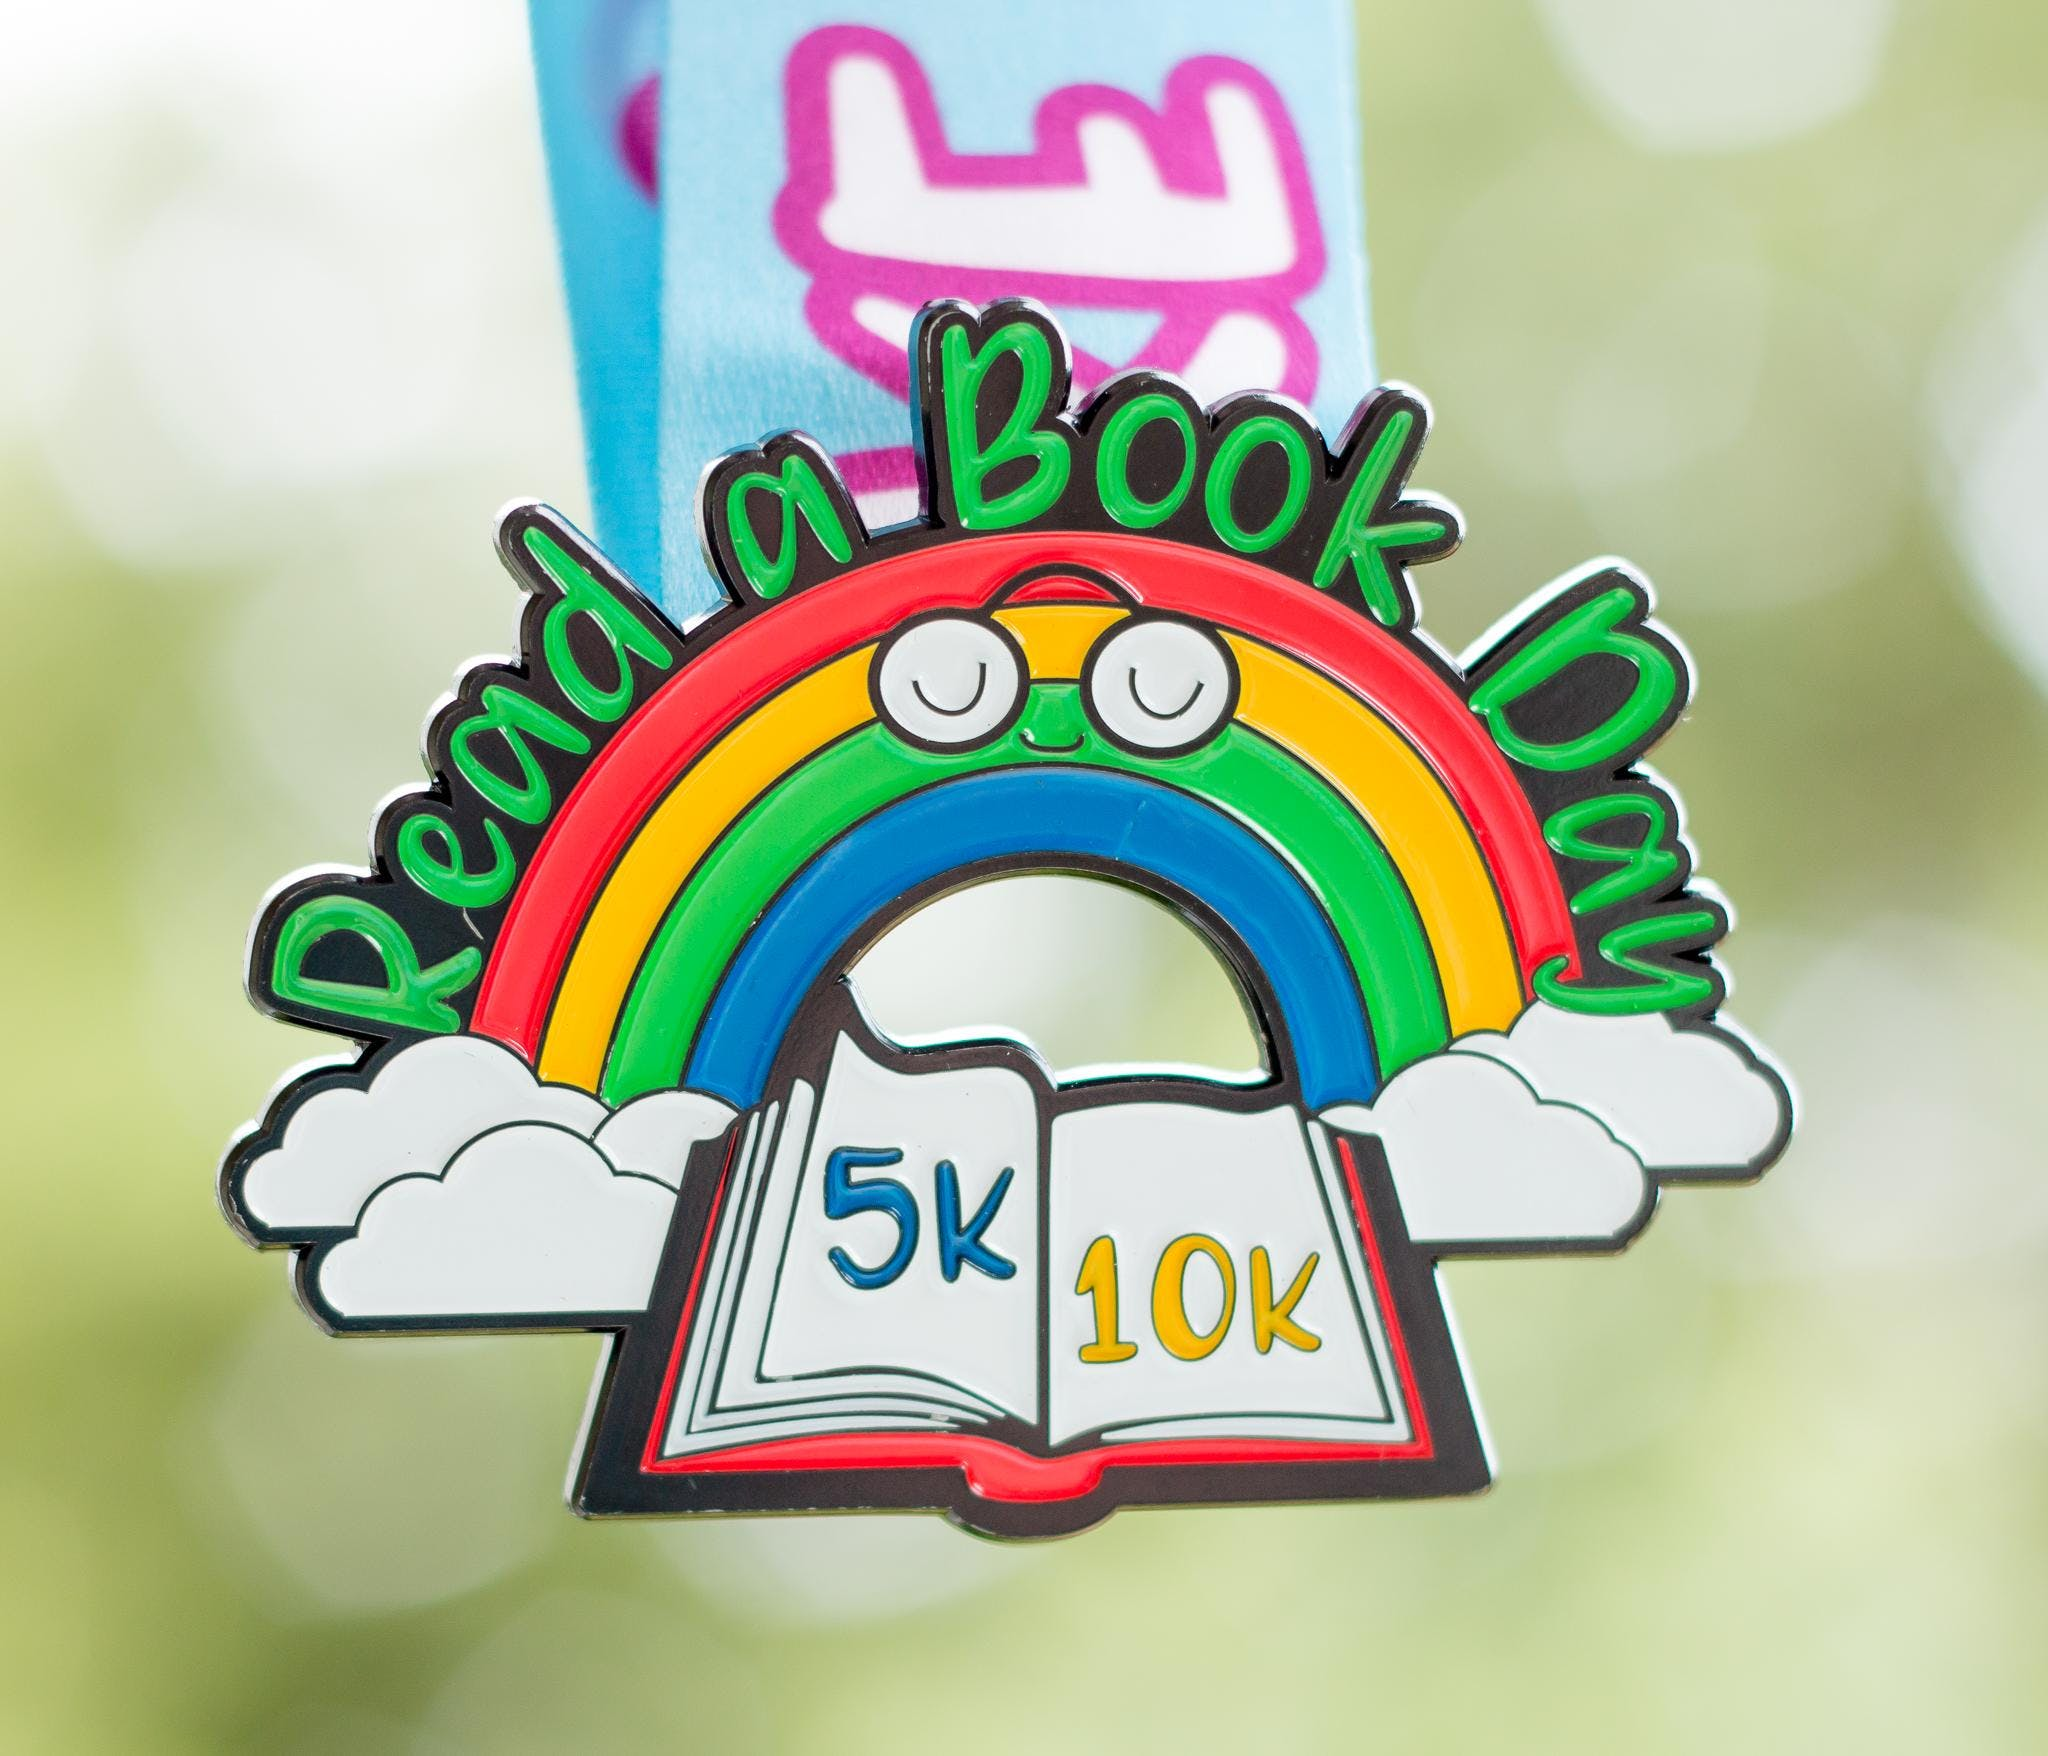 Read a Book Day 5K & 10K - Take a Look, It's in a Book -Scottsdale